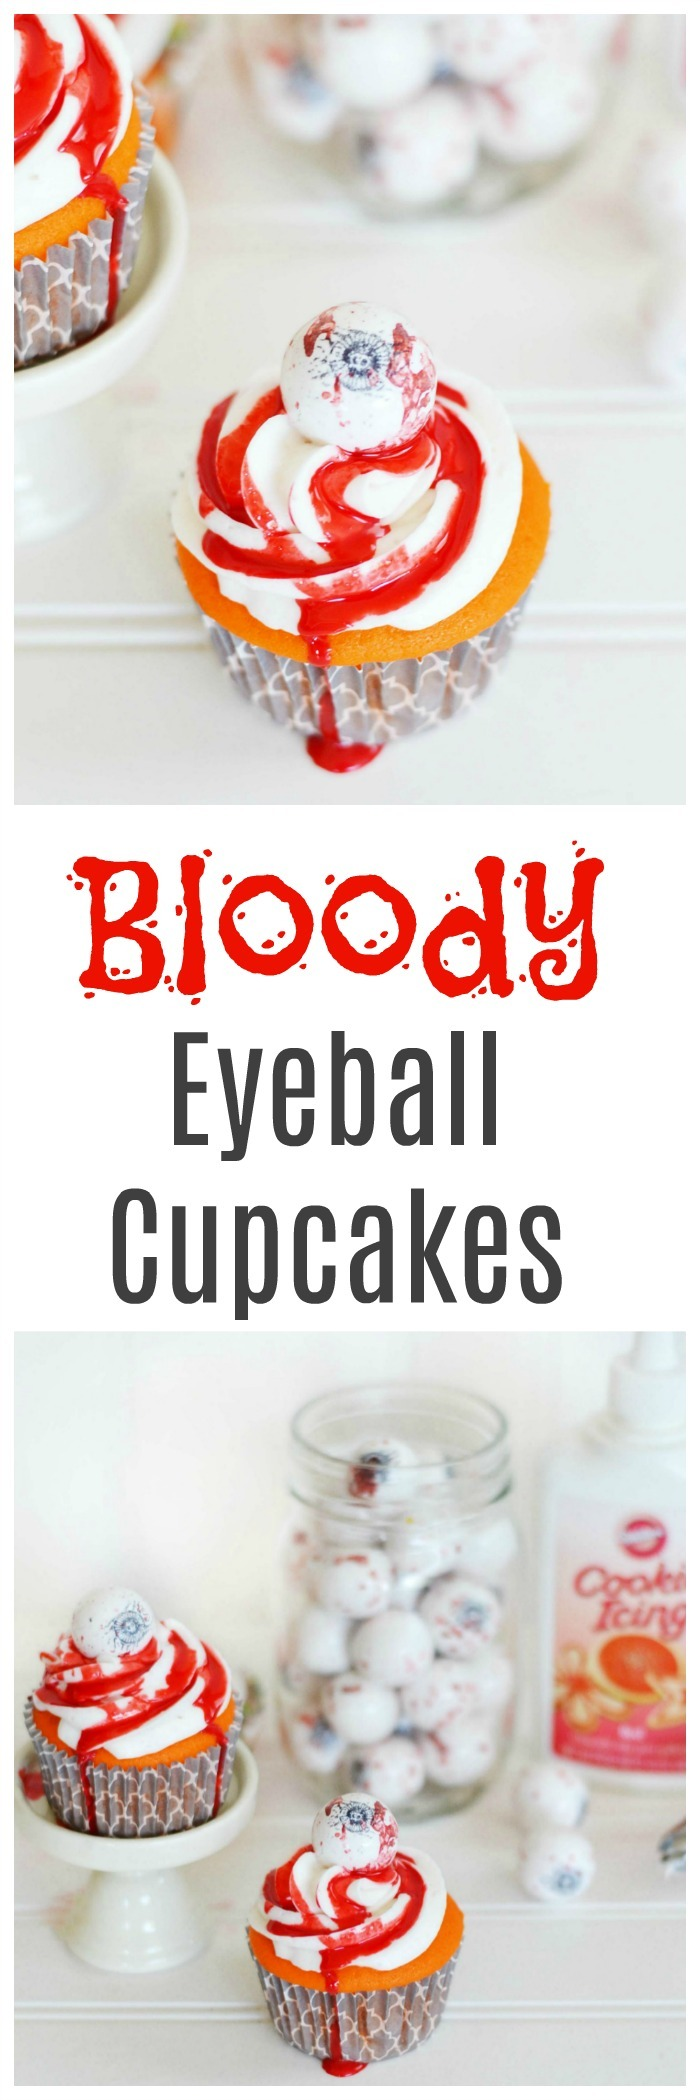 Easy Halloween Bloody Eyeball Cupcakes